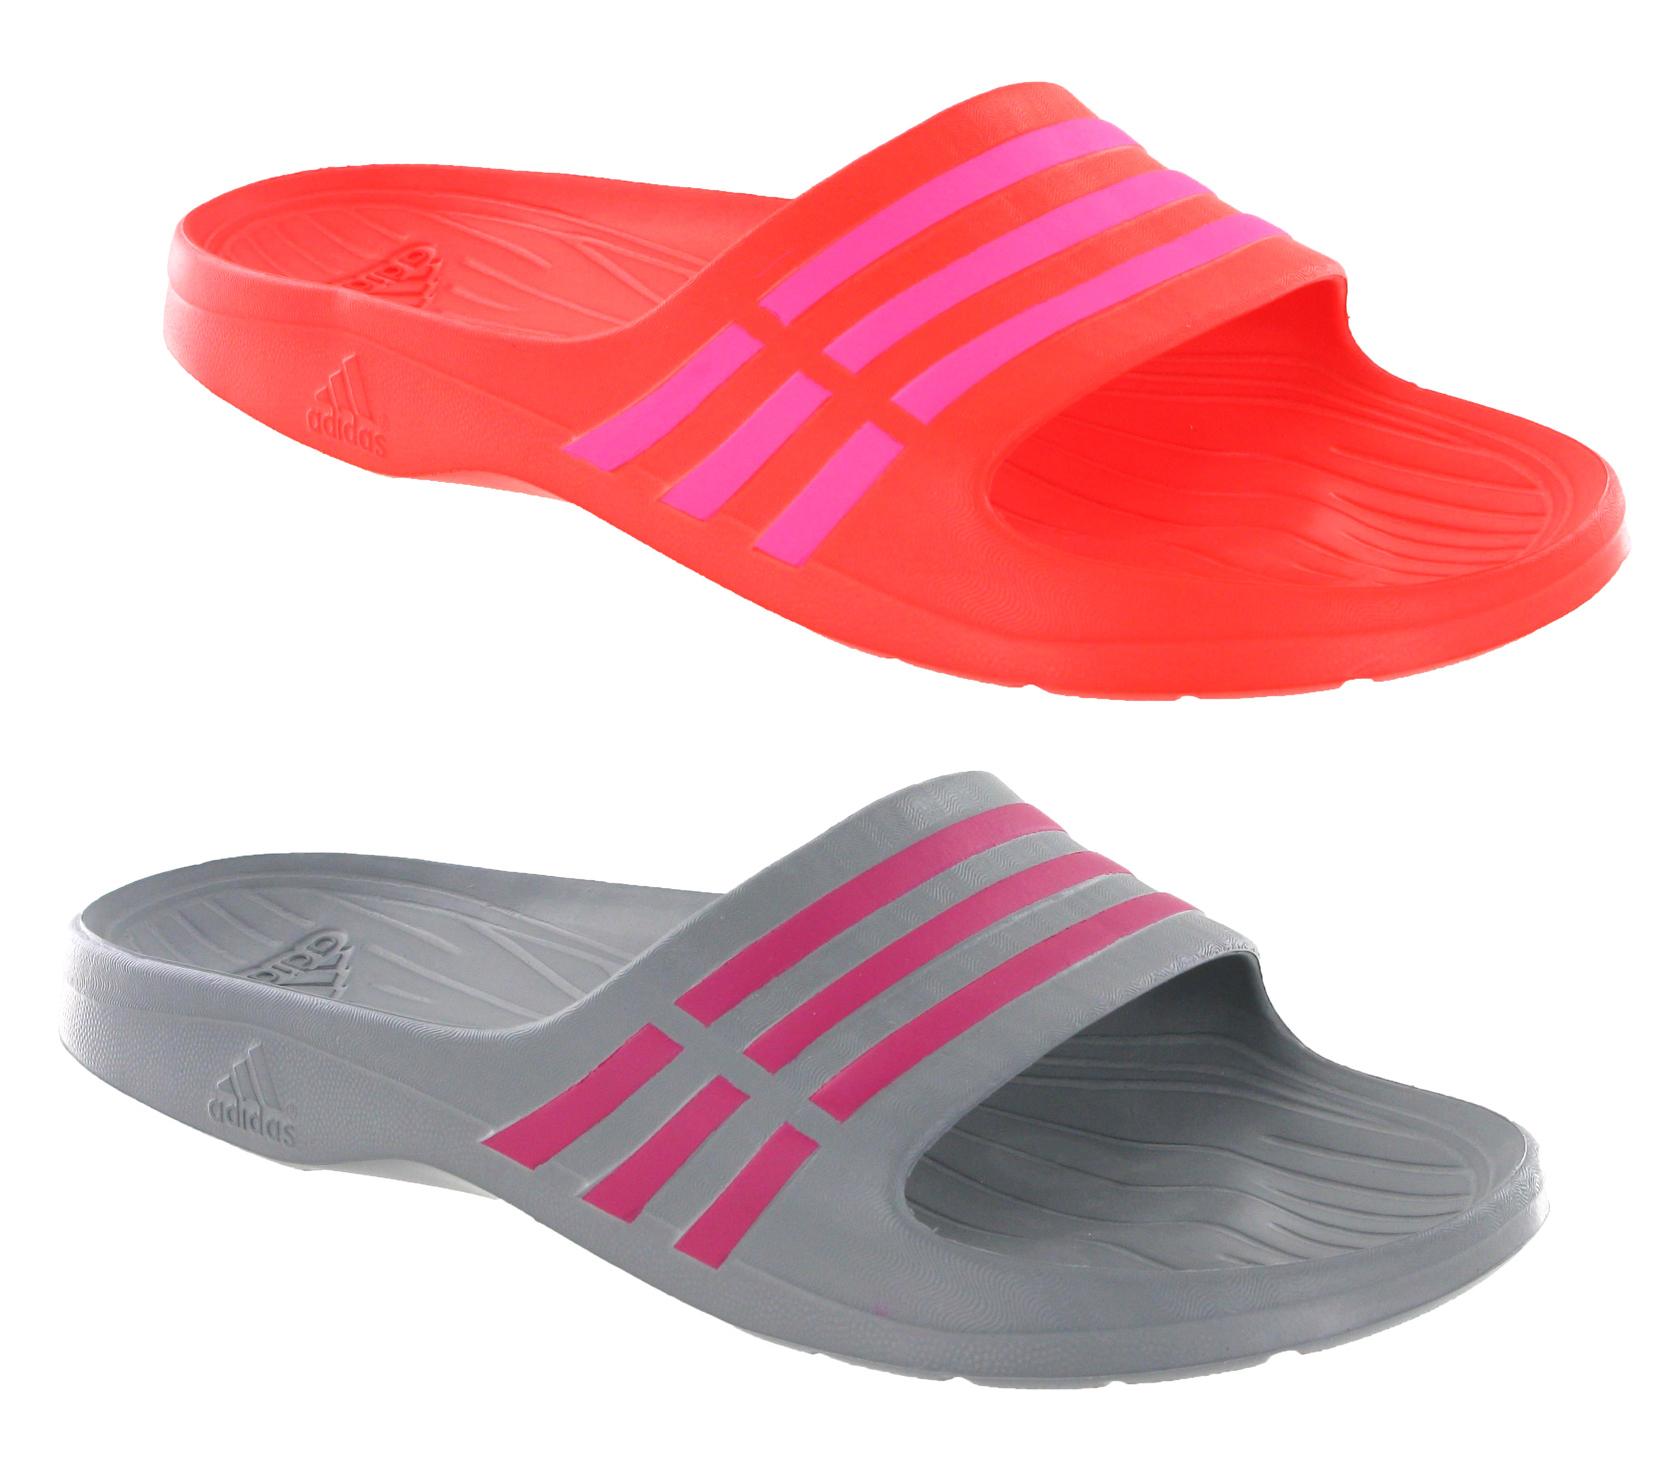 2d041fb0454 Image is loading New-Womens-Adidas-Duramo-Sleek-Slide-Flip-Flops-